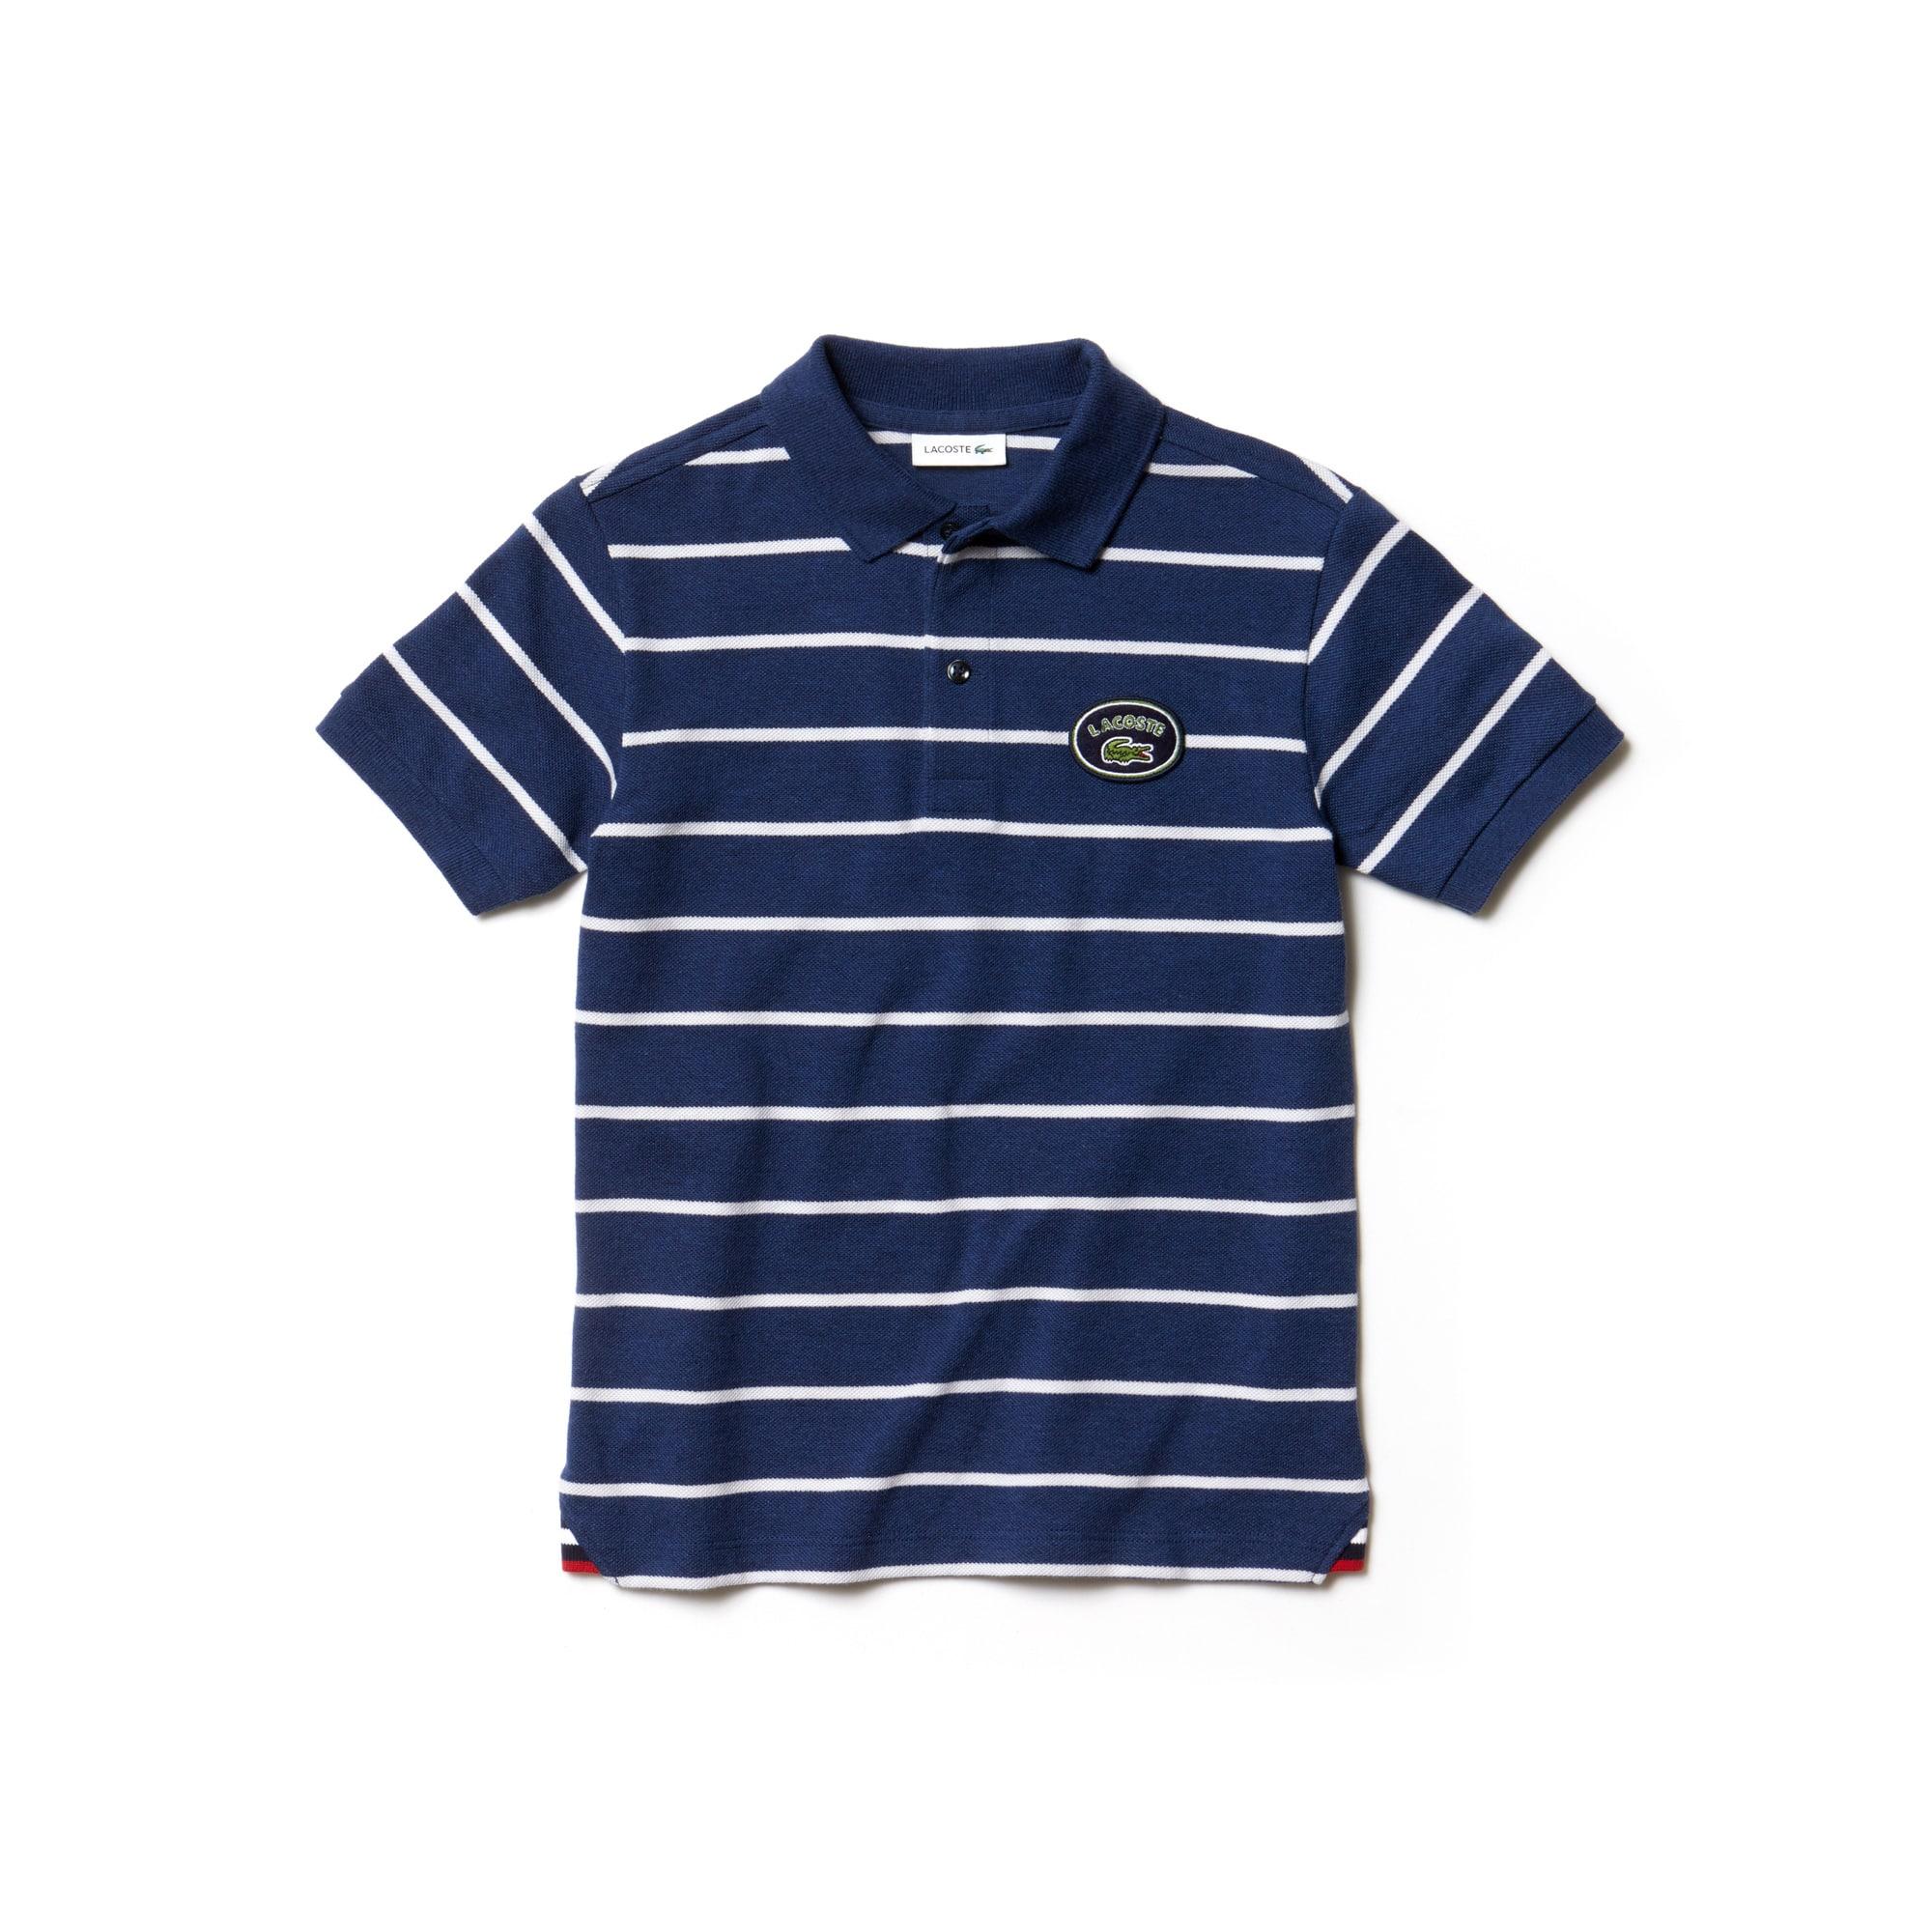 Lacoste条纹棉质凸纹网眼面料男童Polo衫